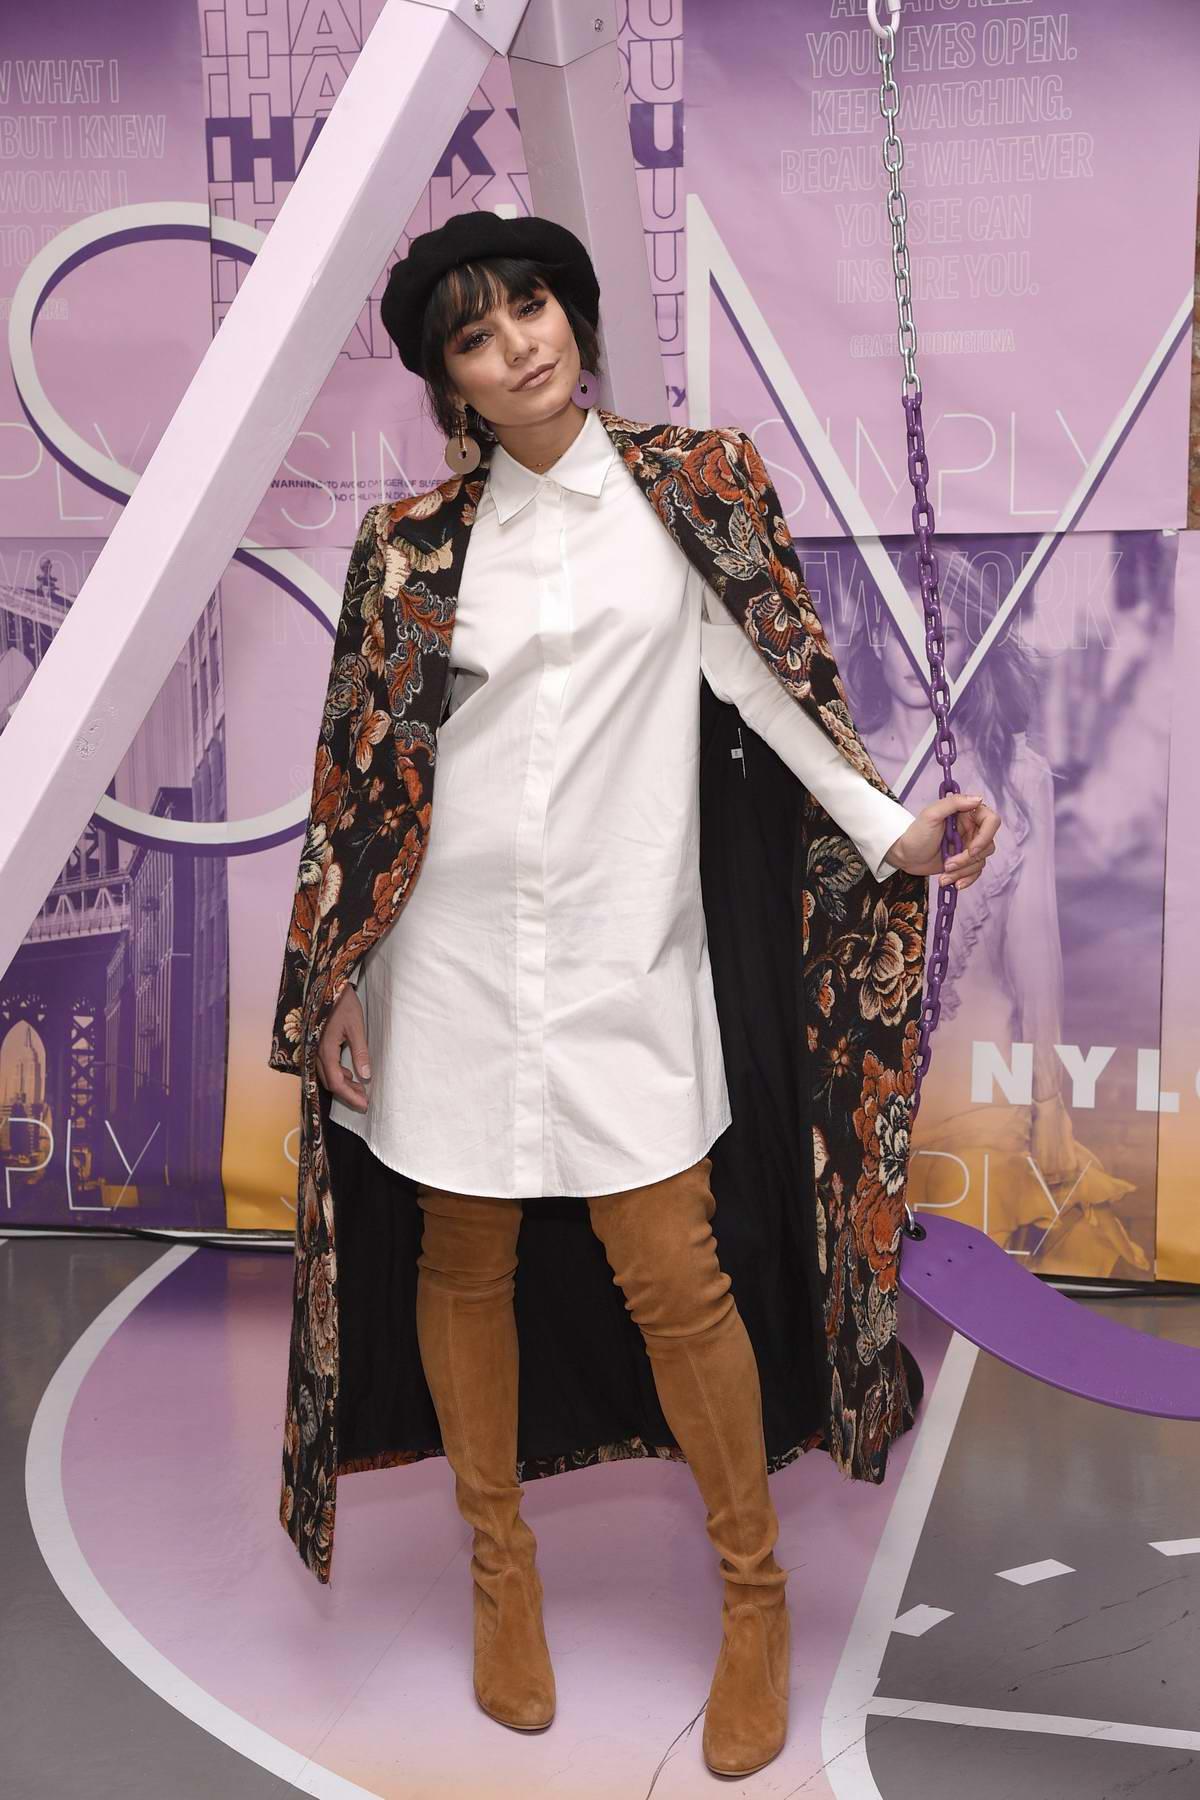 Vanessa Hudgens at SIMPLY NYC Conference VIP Dinner at Marta at The Redbury in New York